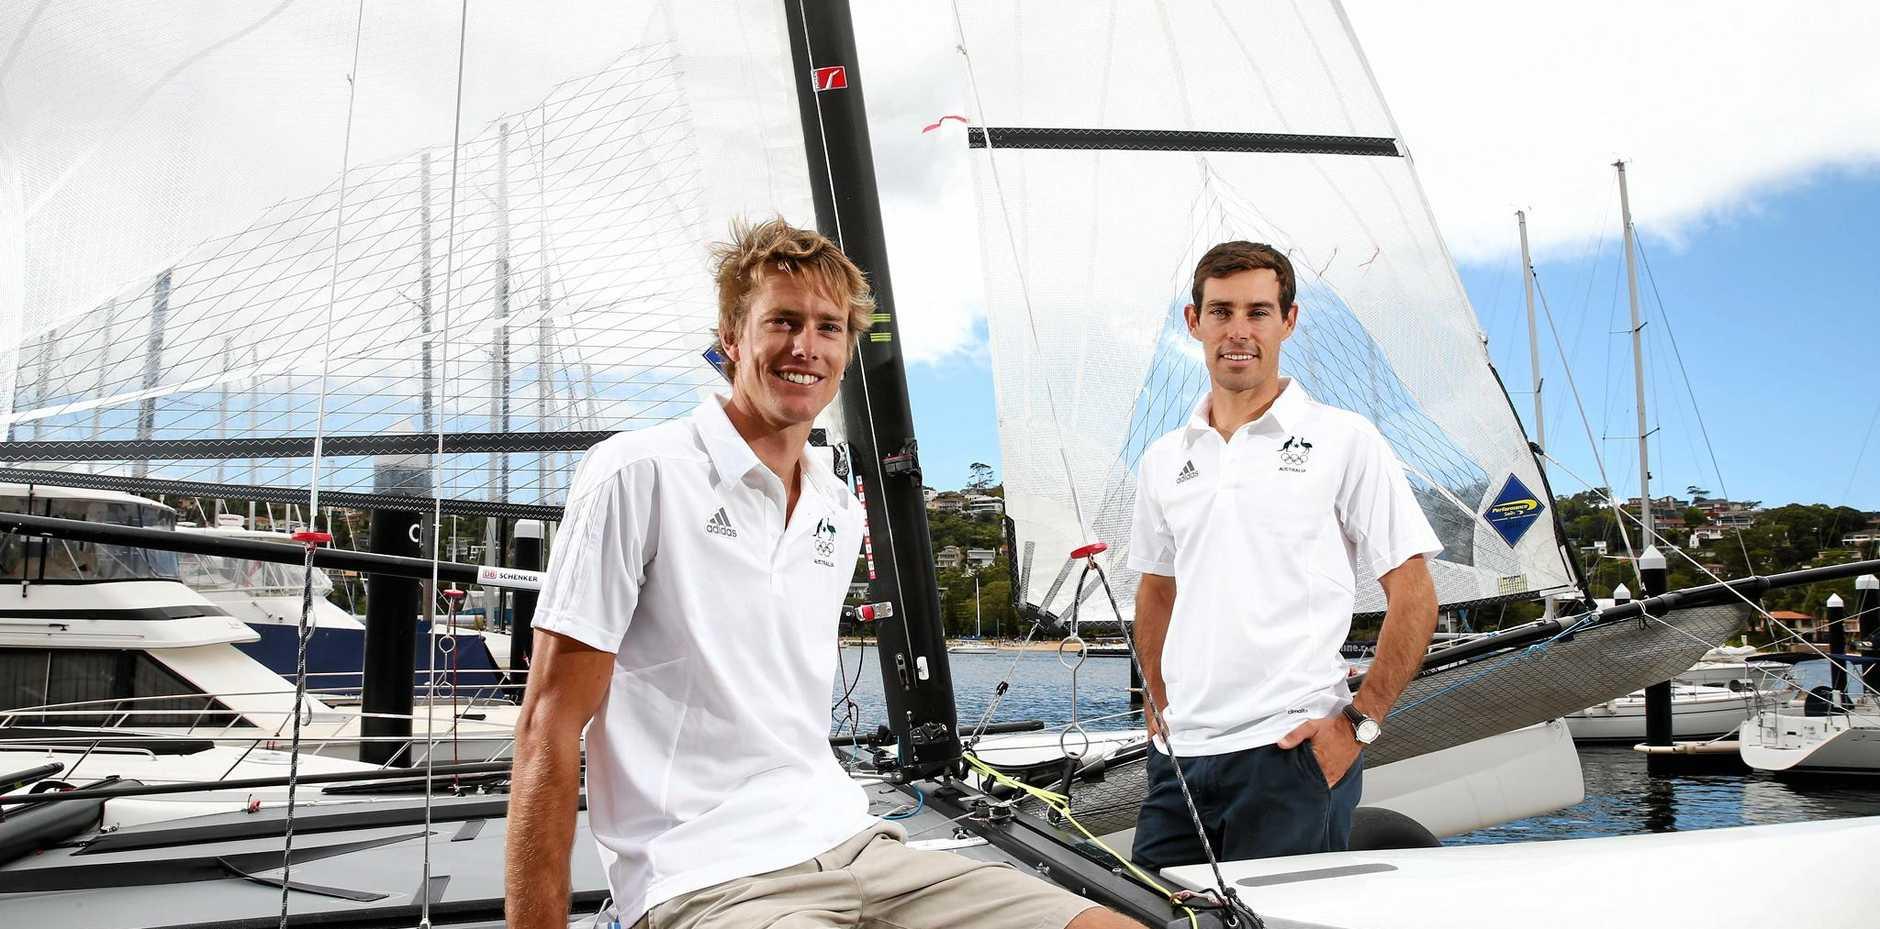 Sailors Will Ryan and Mathew Belcher (right).